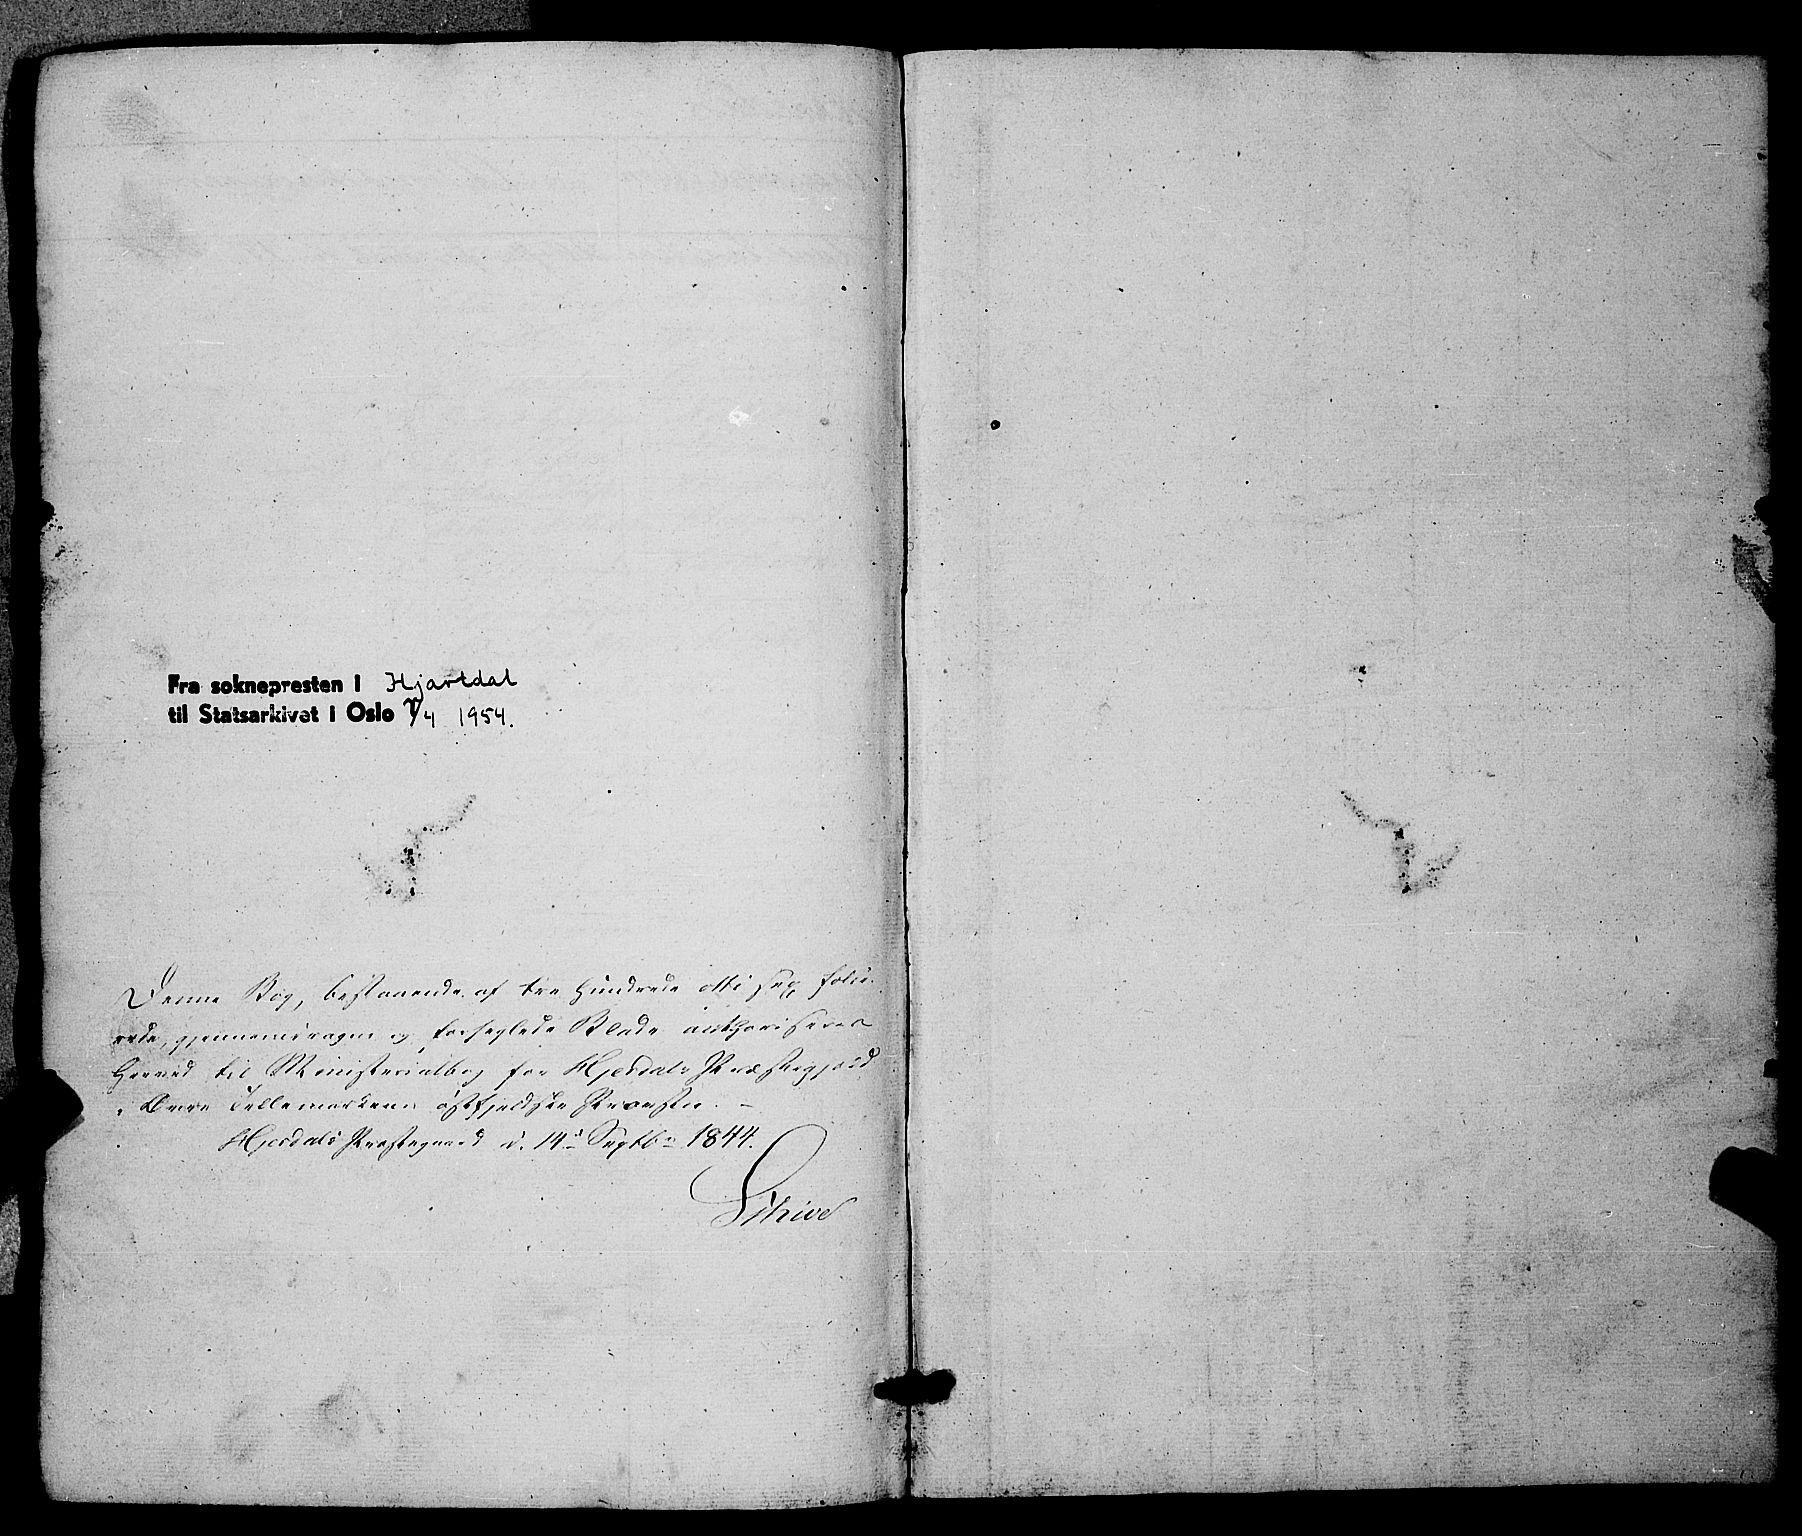 SAKO, Hjartdal kirkebøker, F/Fa/L0008: Ministerialbok nr. I 8, 1844-1859